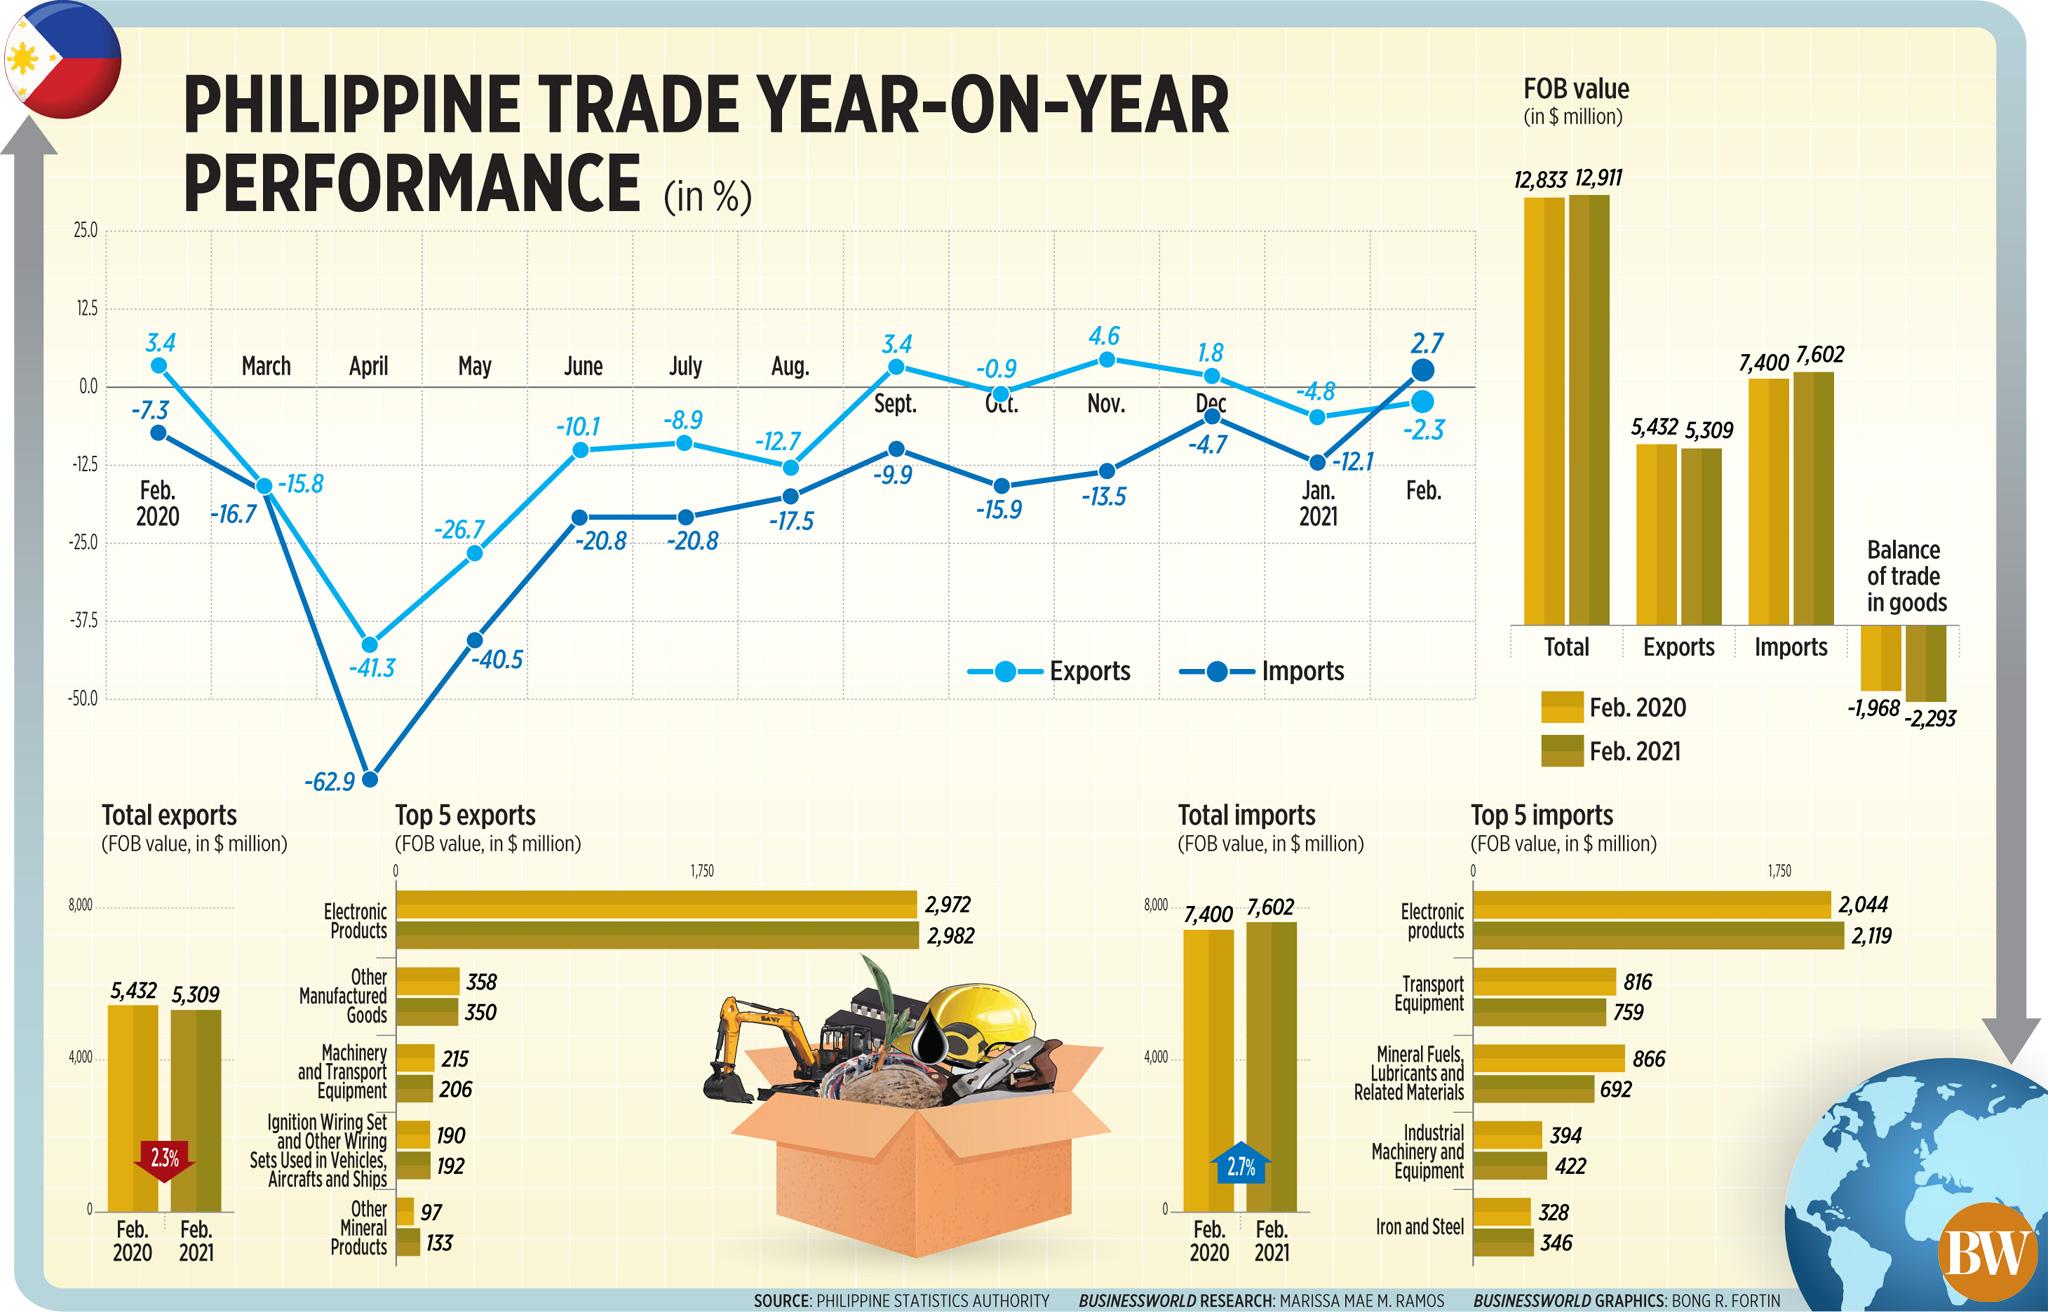 Philippine trade year-on-year performance (Feb. 2021)